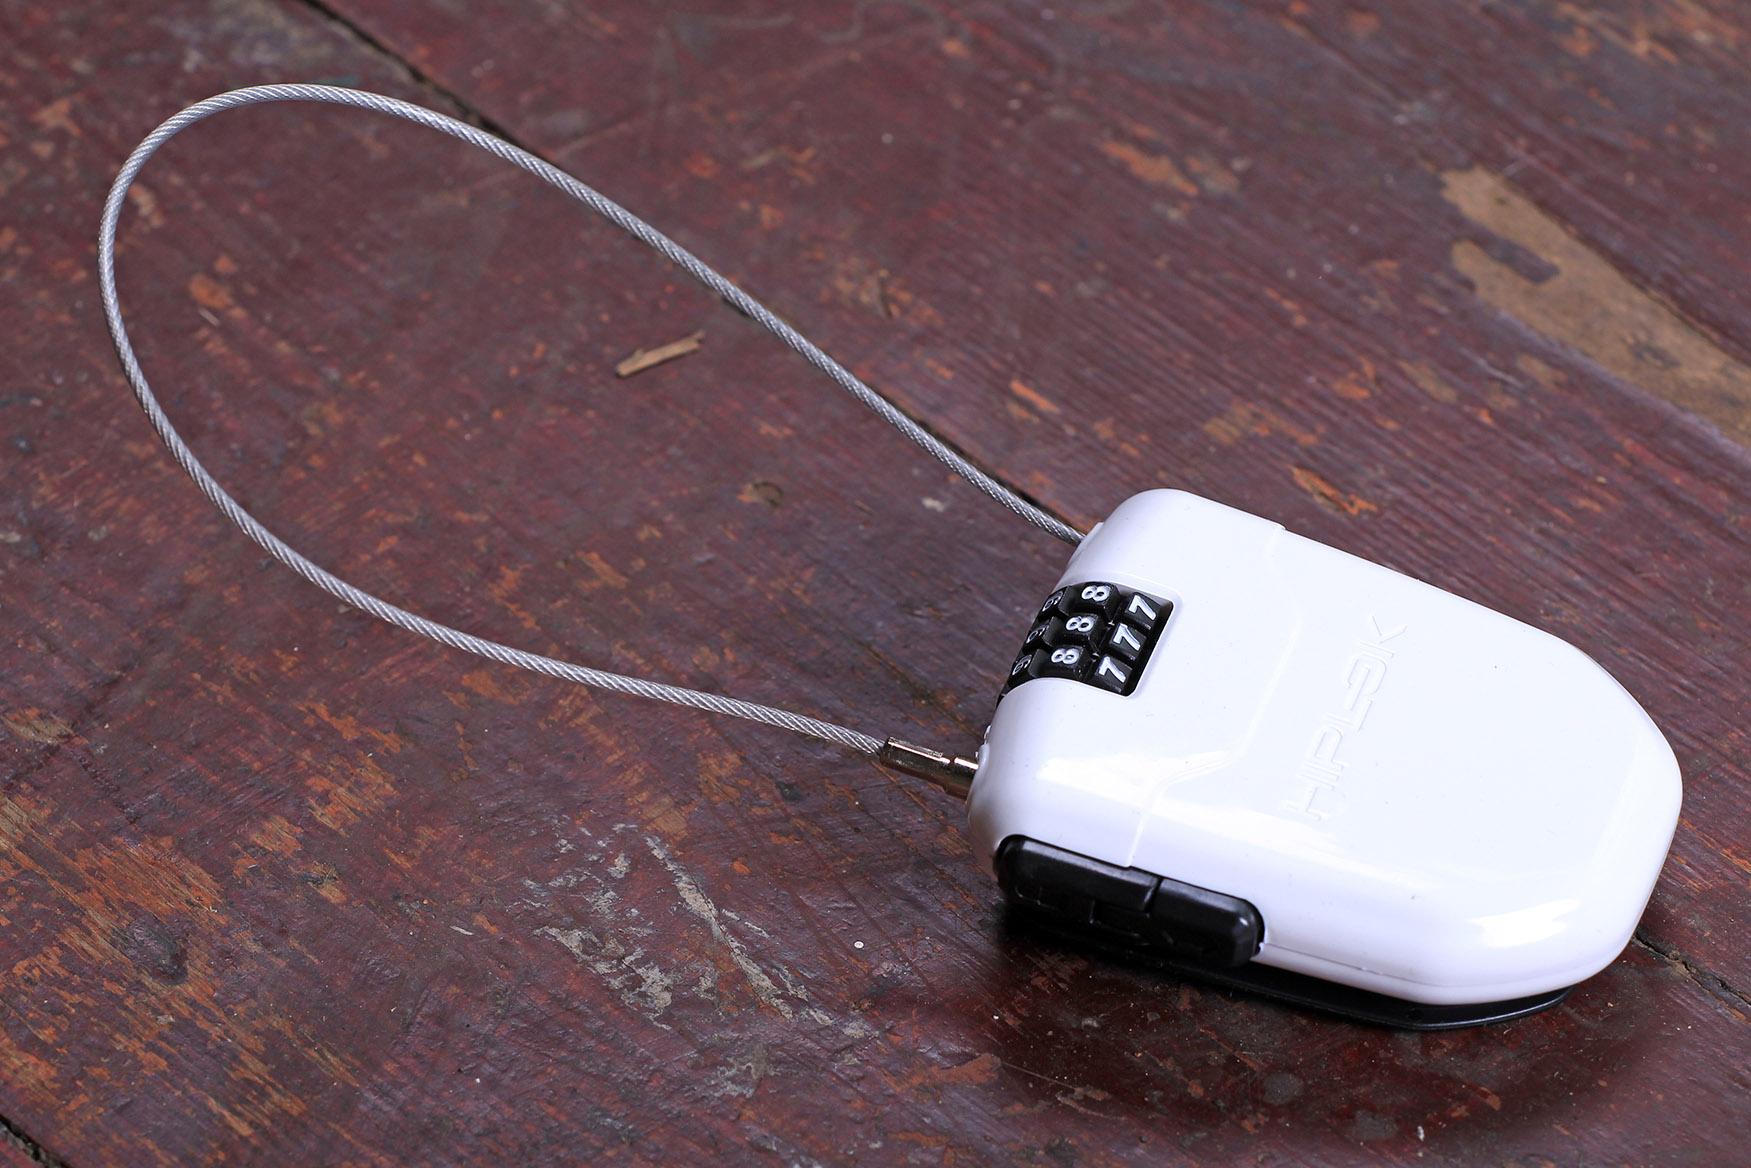 Hiplok FLX RETRACTABLE STEEL CABLE BIKE COMBINATION LOCK REAR LIGHT 1m WHITE